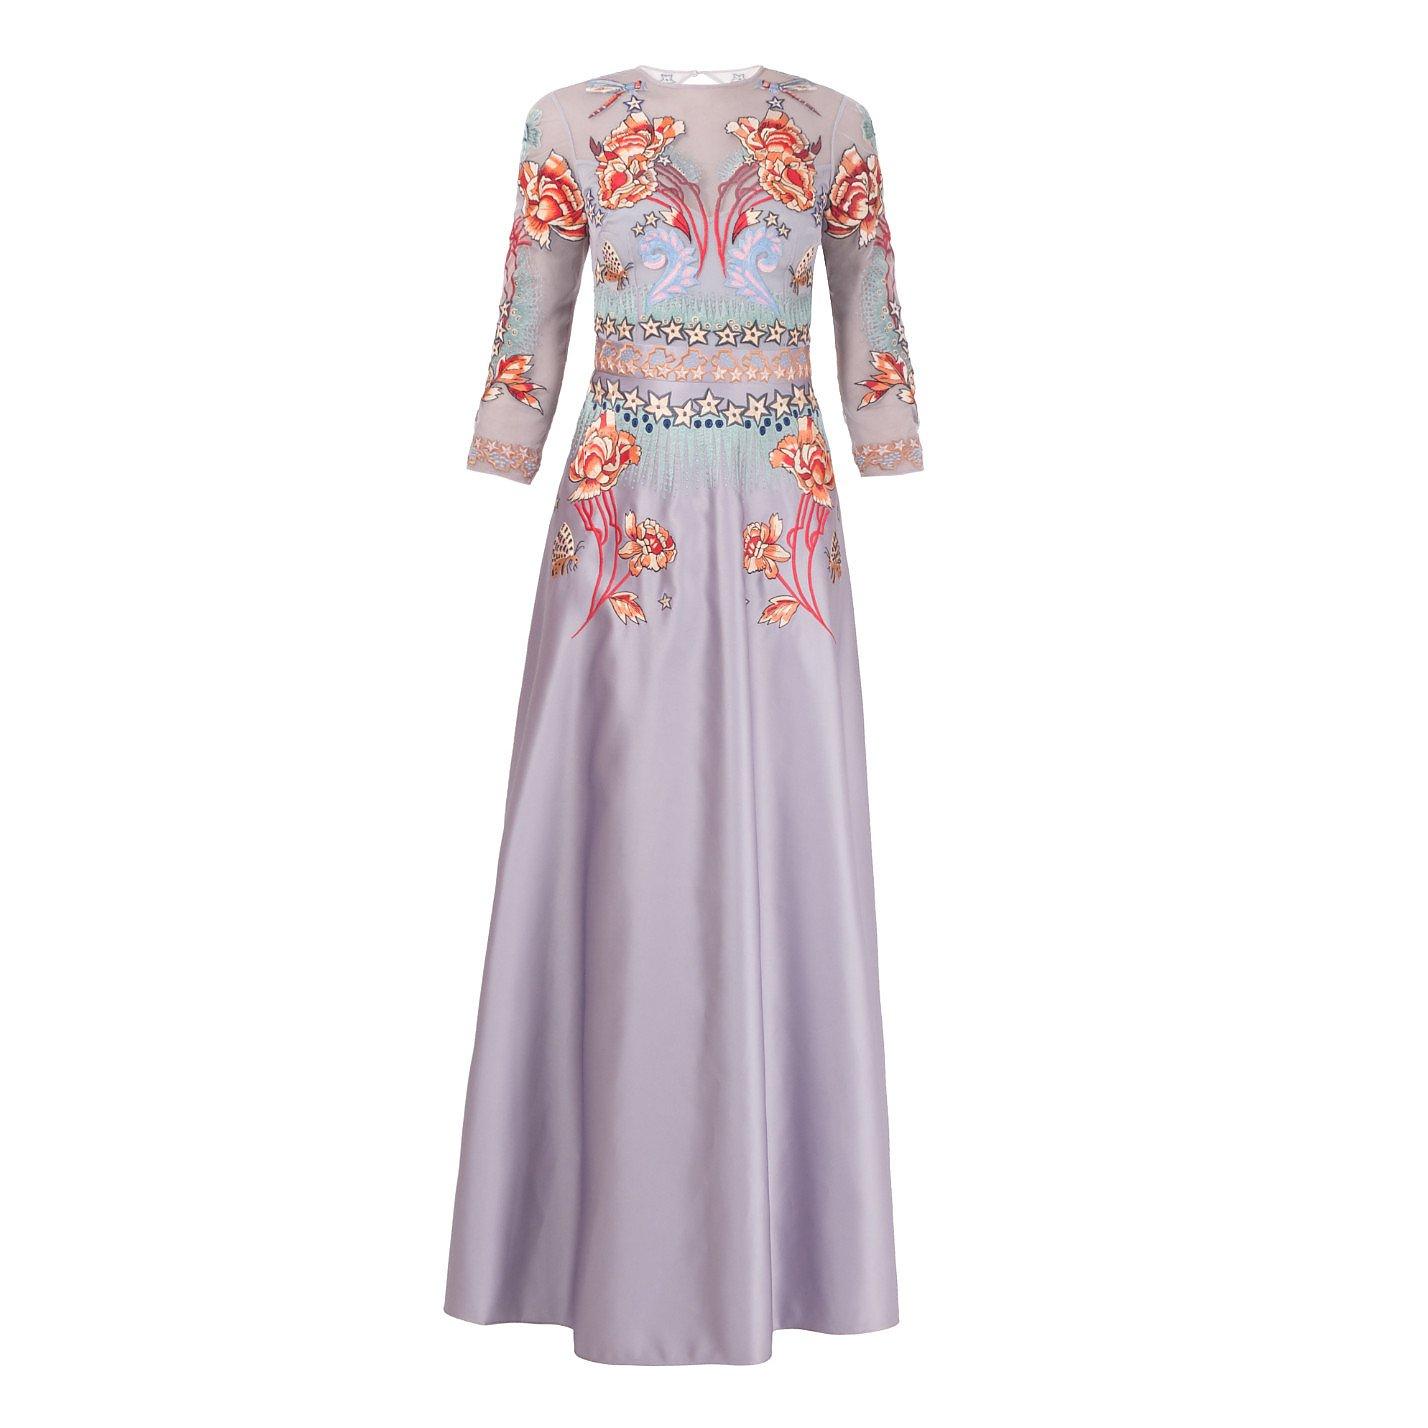 Temperley London Porcelain Flared Dress